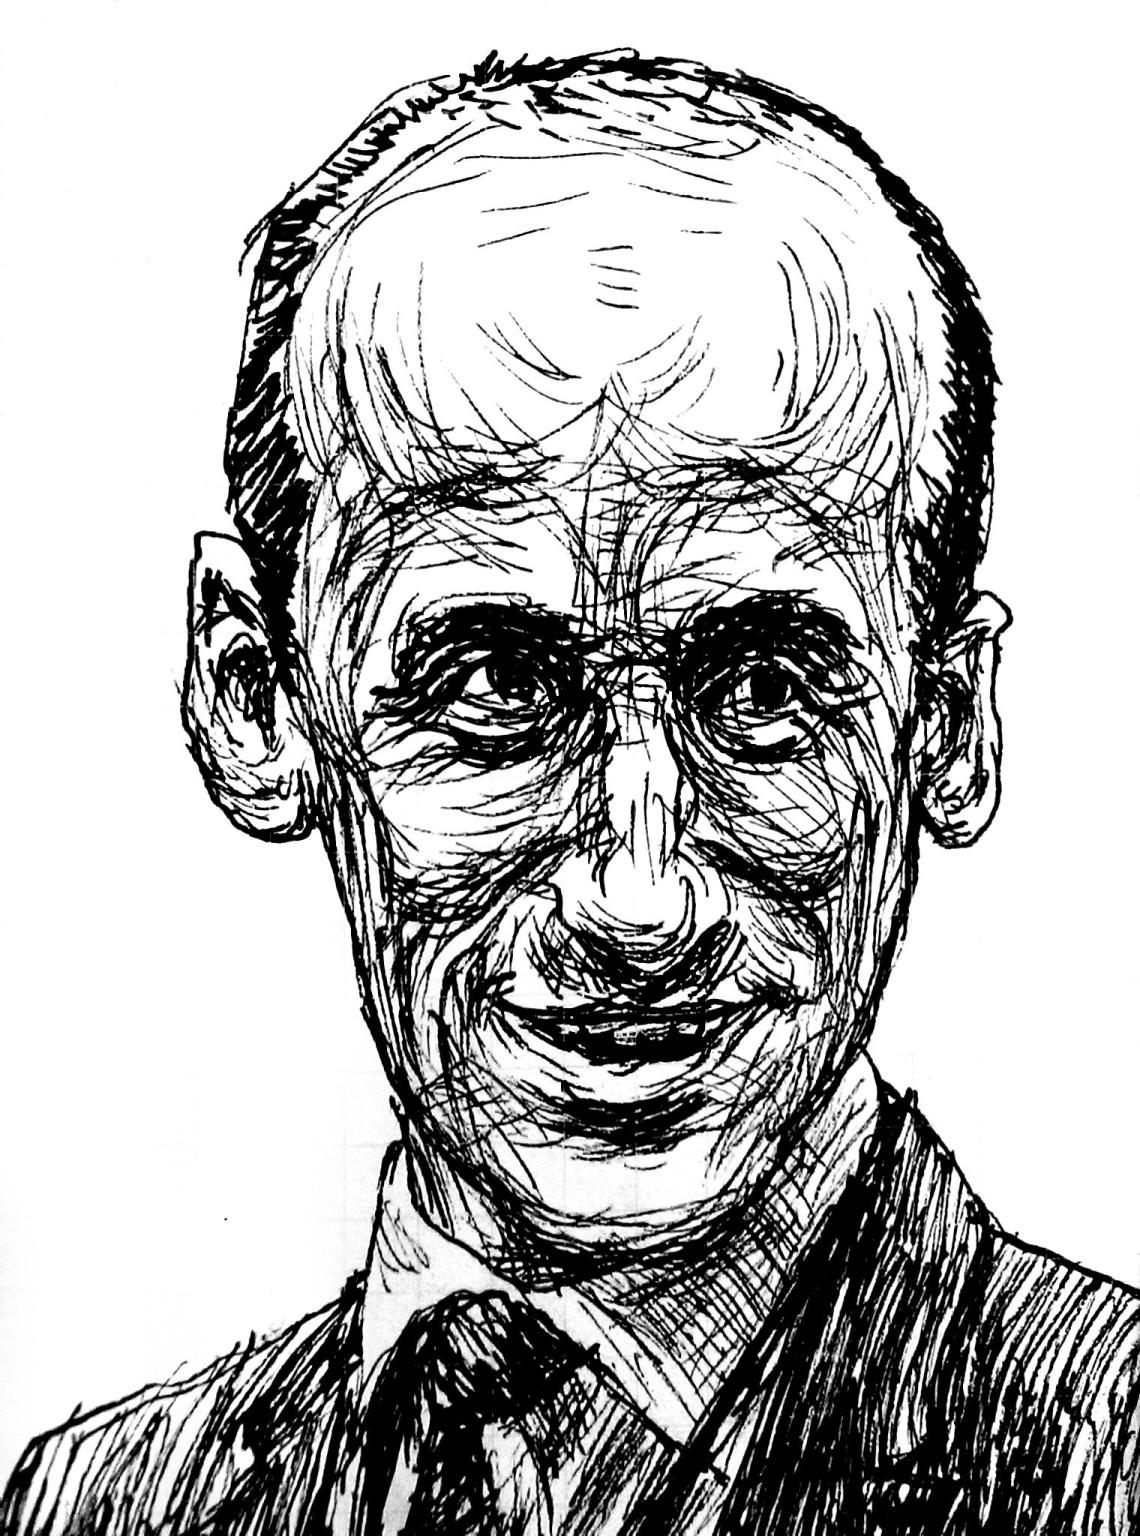 Stephen Miller illustration